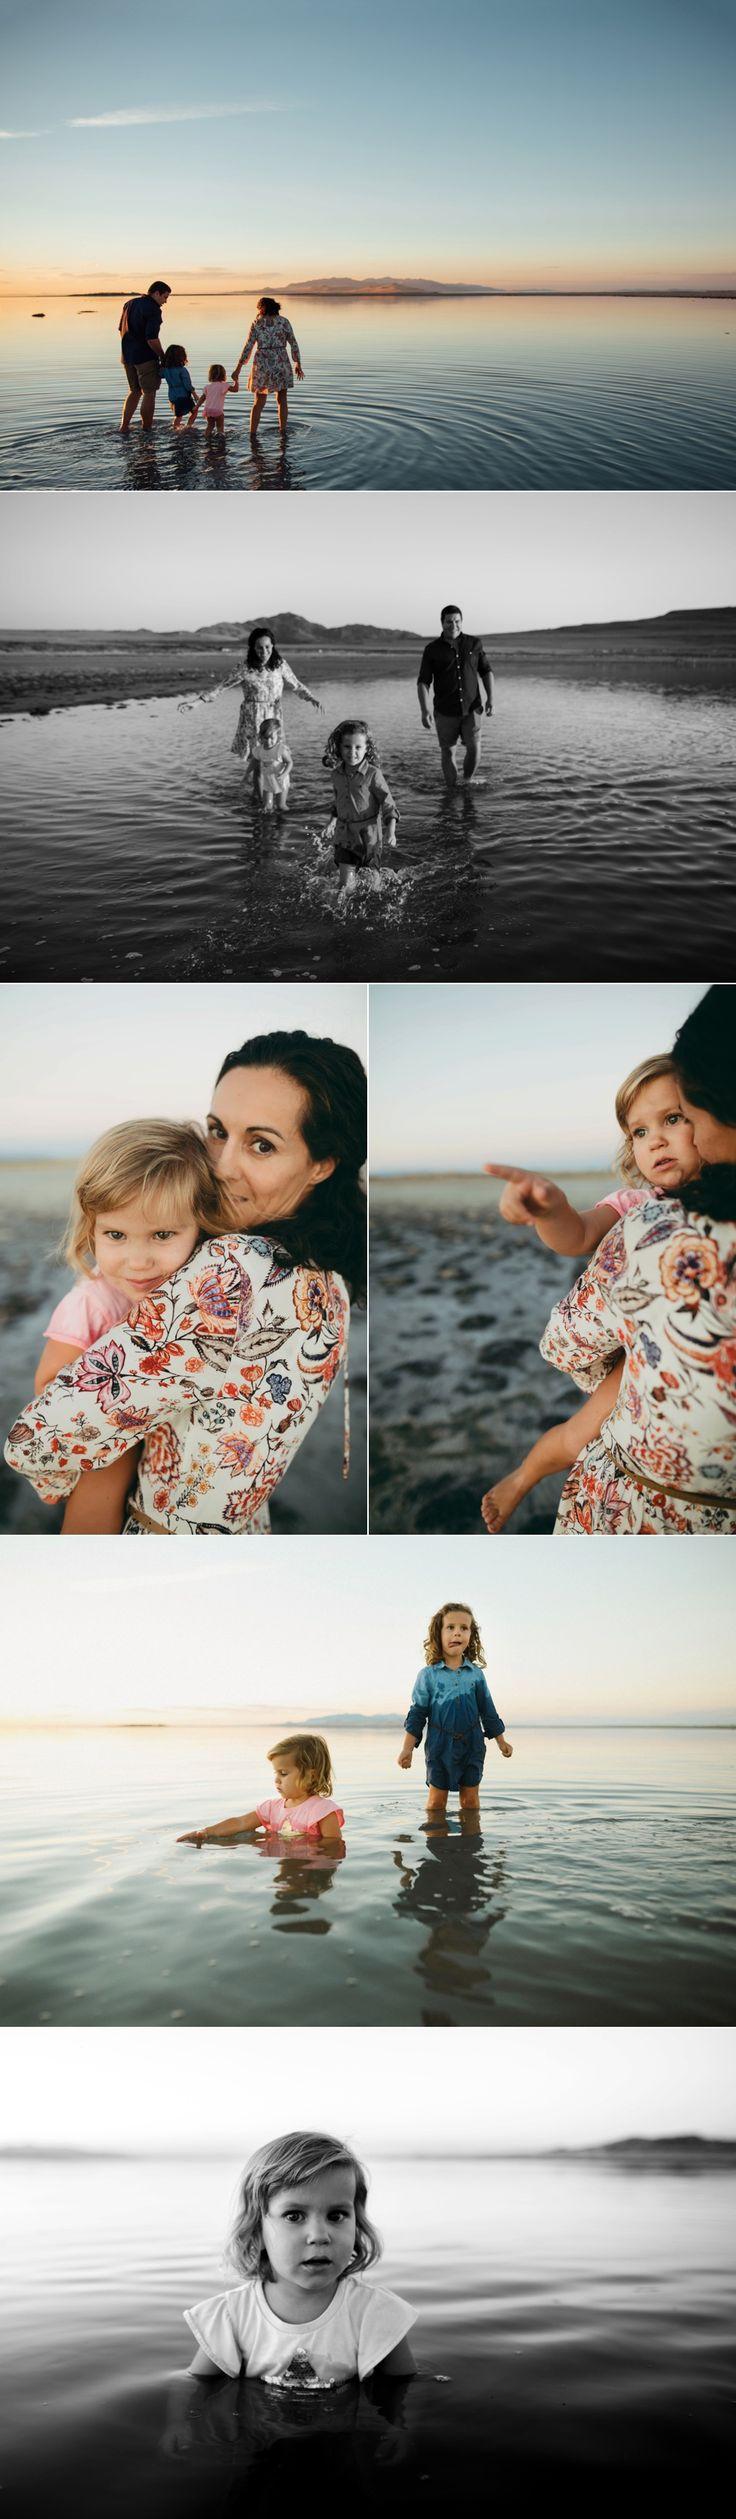 © Summer Murdock | Photographer, Lifestyle Photography, Utah Family Photographer, Family Photography, Antelope Island, The Great Salt Lake